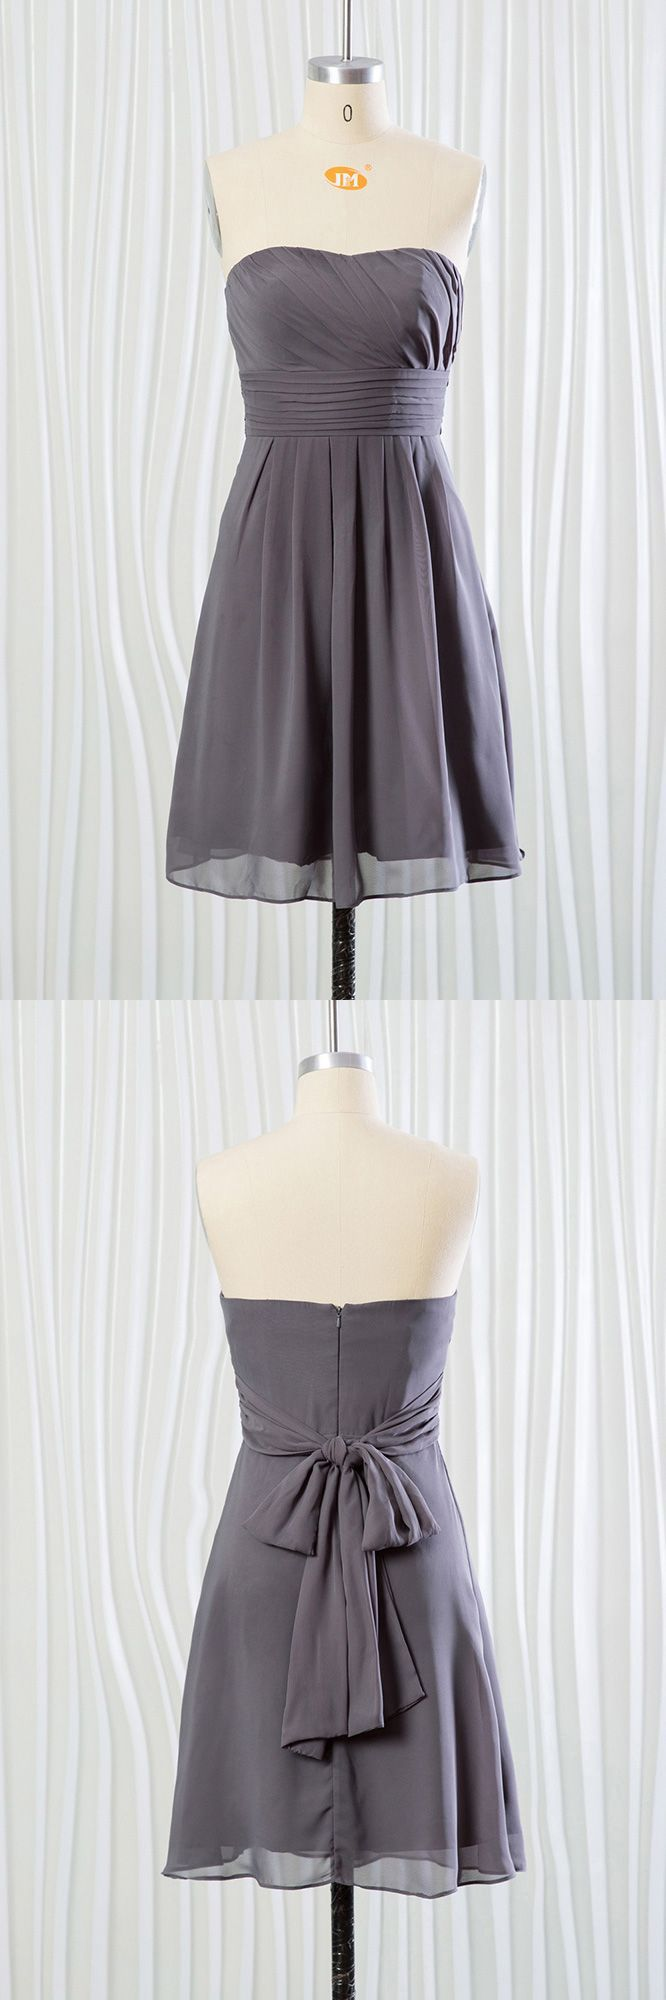 Strapless short grey bridesmaid dress in chiffon for summer wedding